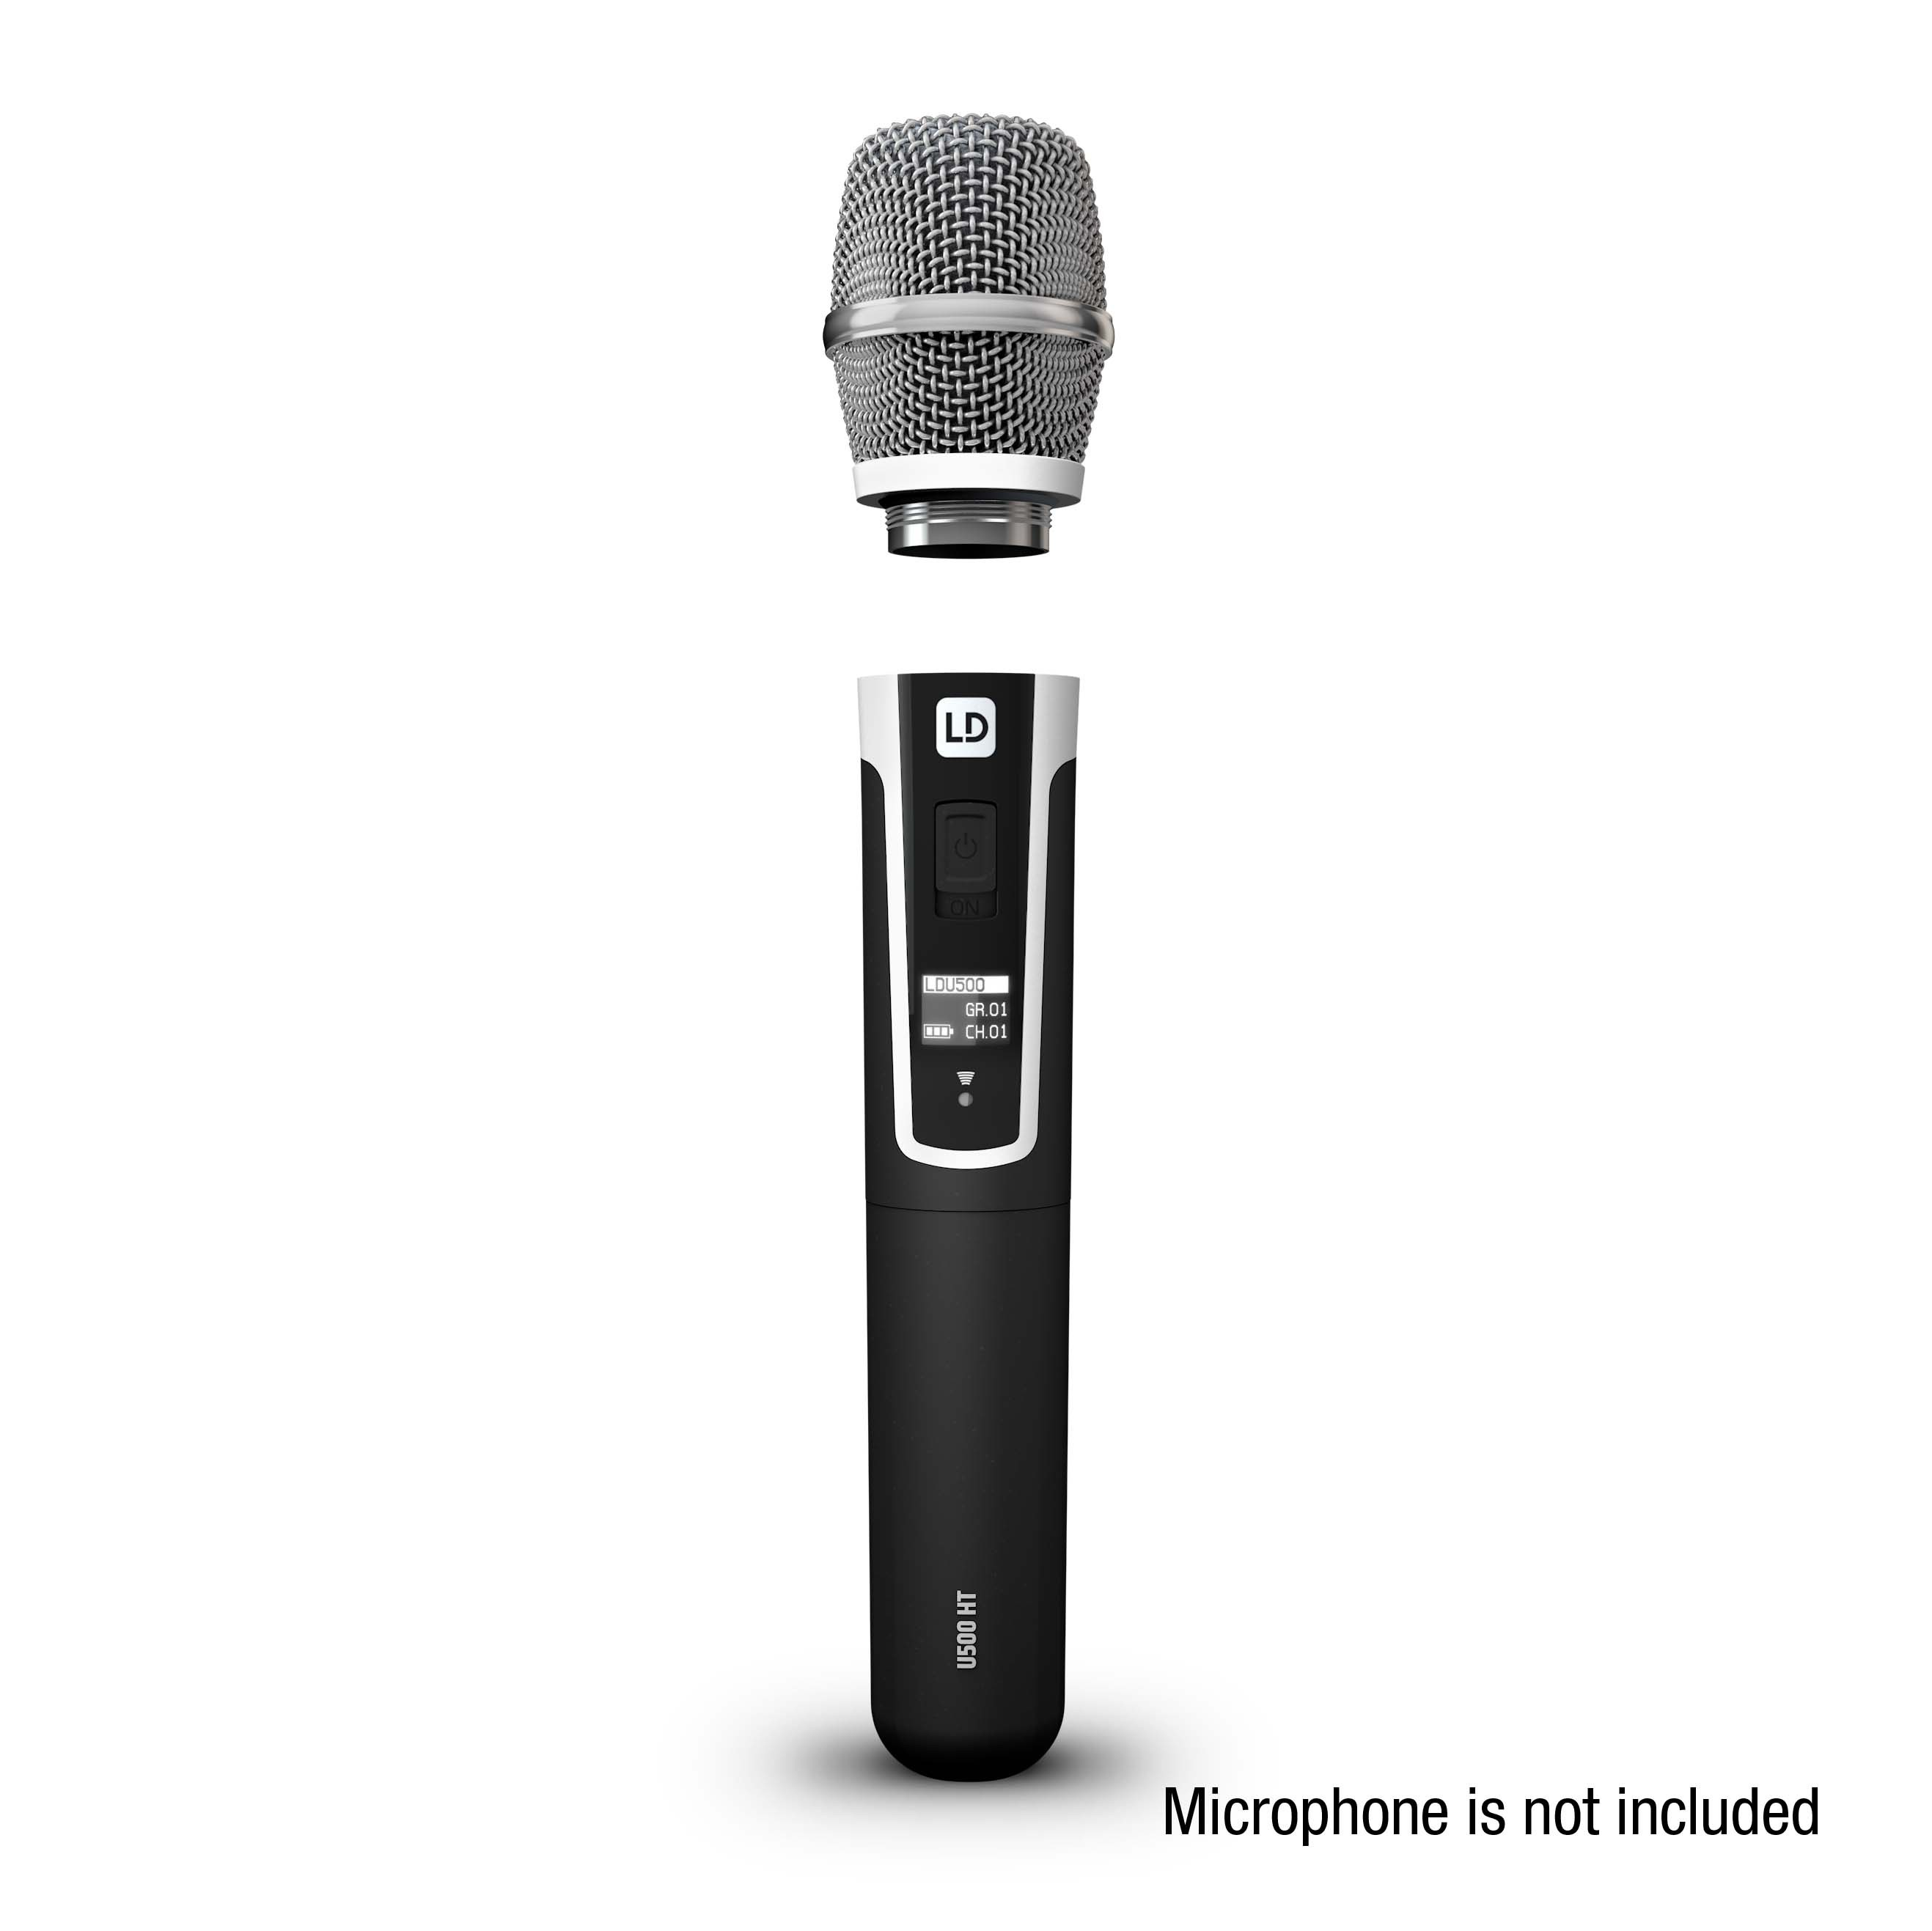 U500 CC Kondensator-Mikrofonkopf mit Nierencharakteristik